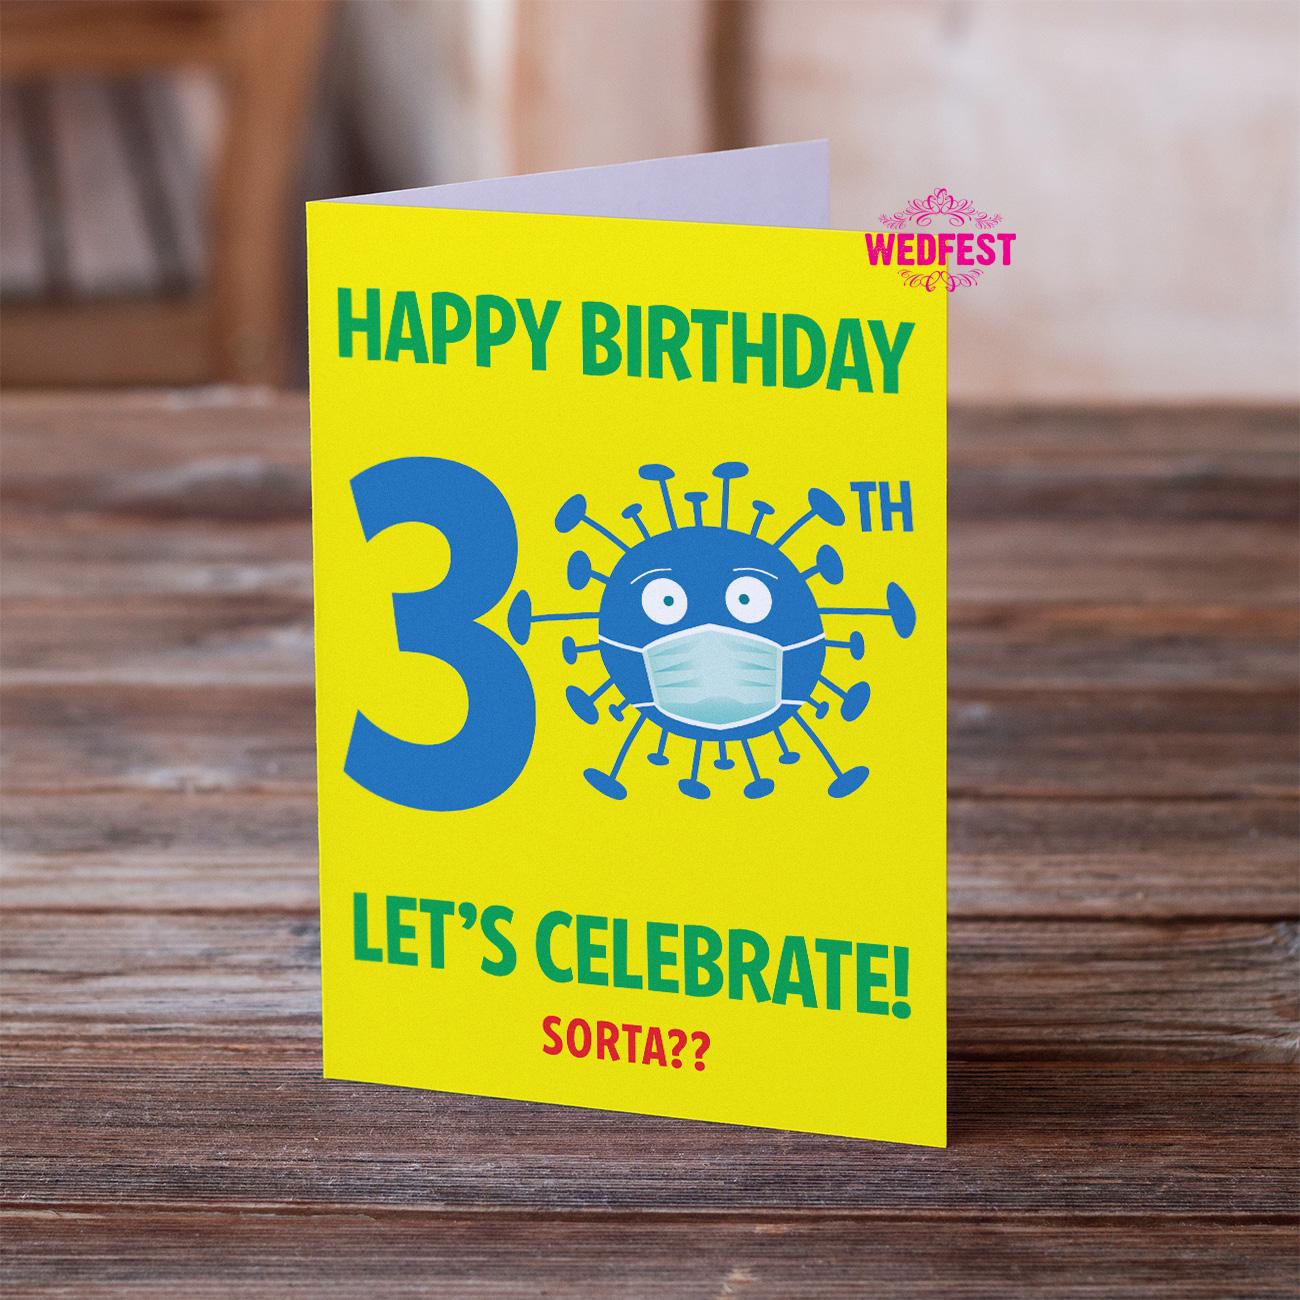 coronavirus covid lockdown 30th birthday cards